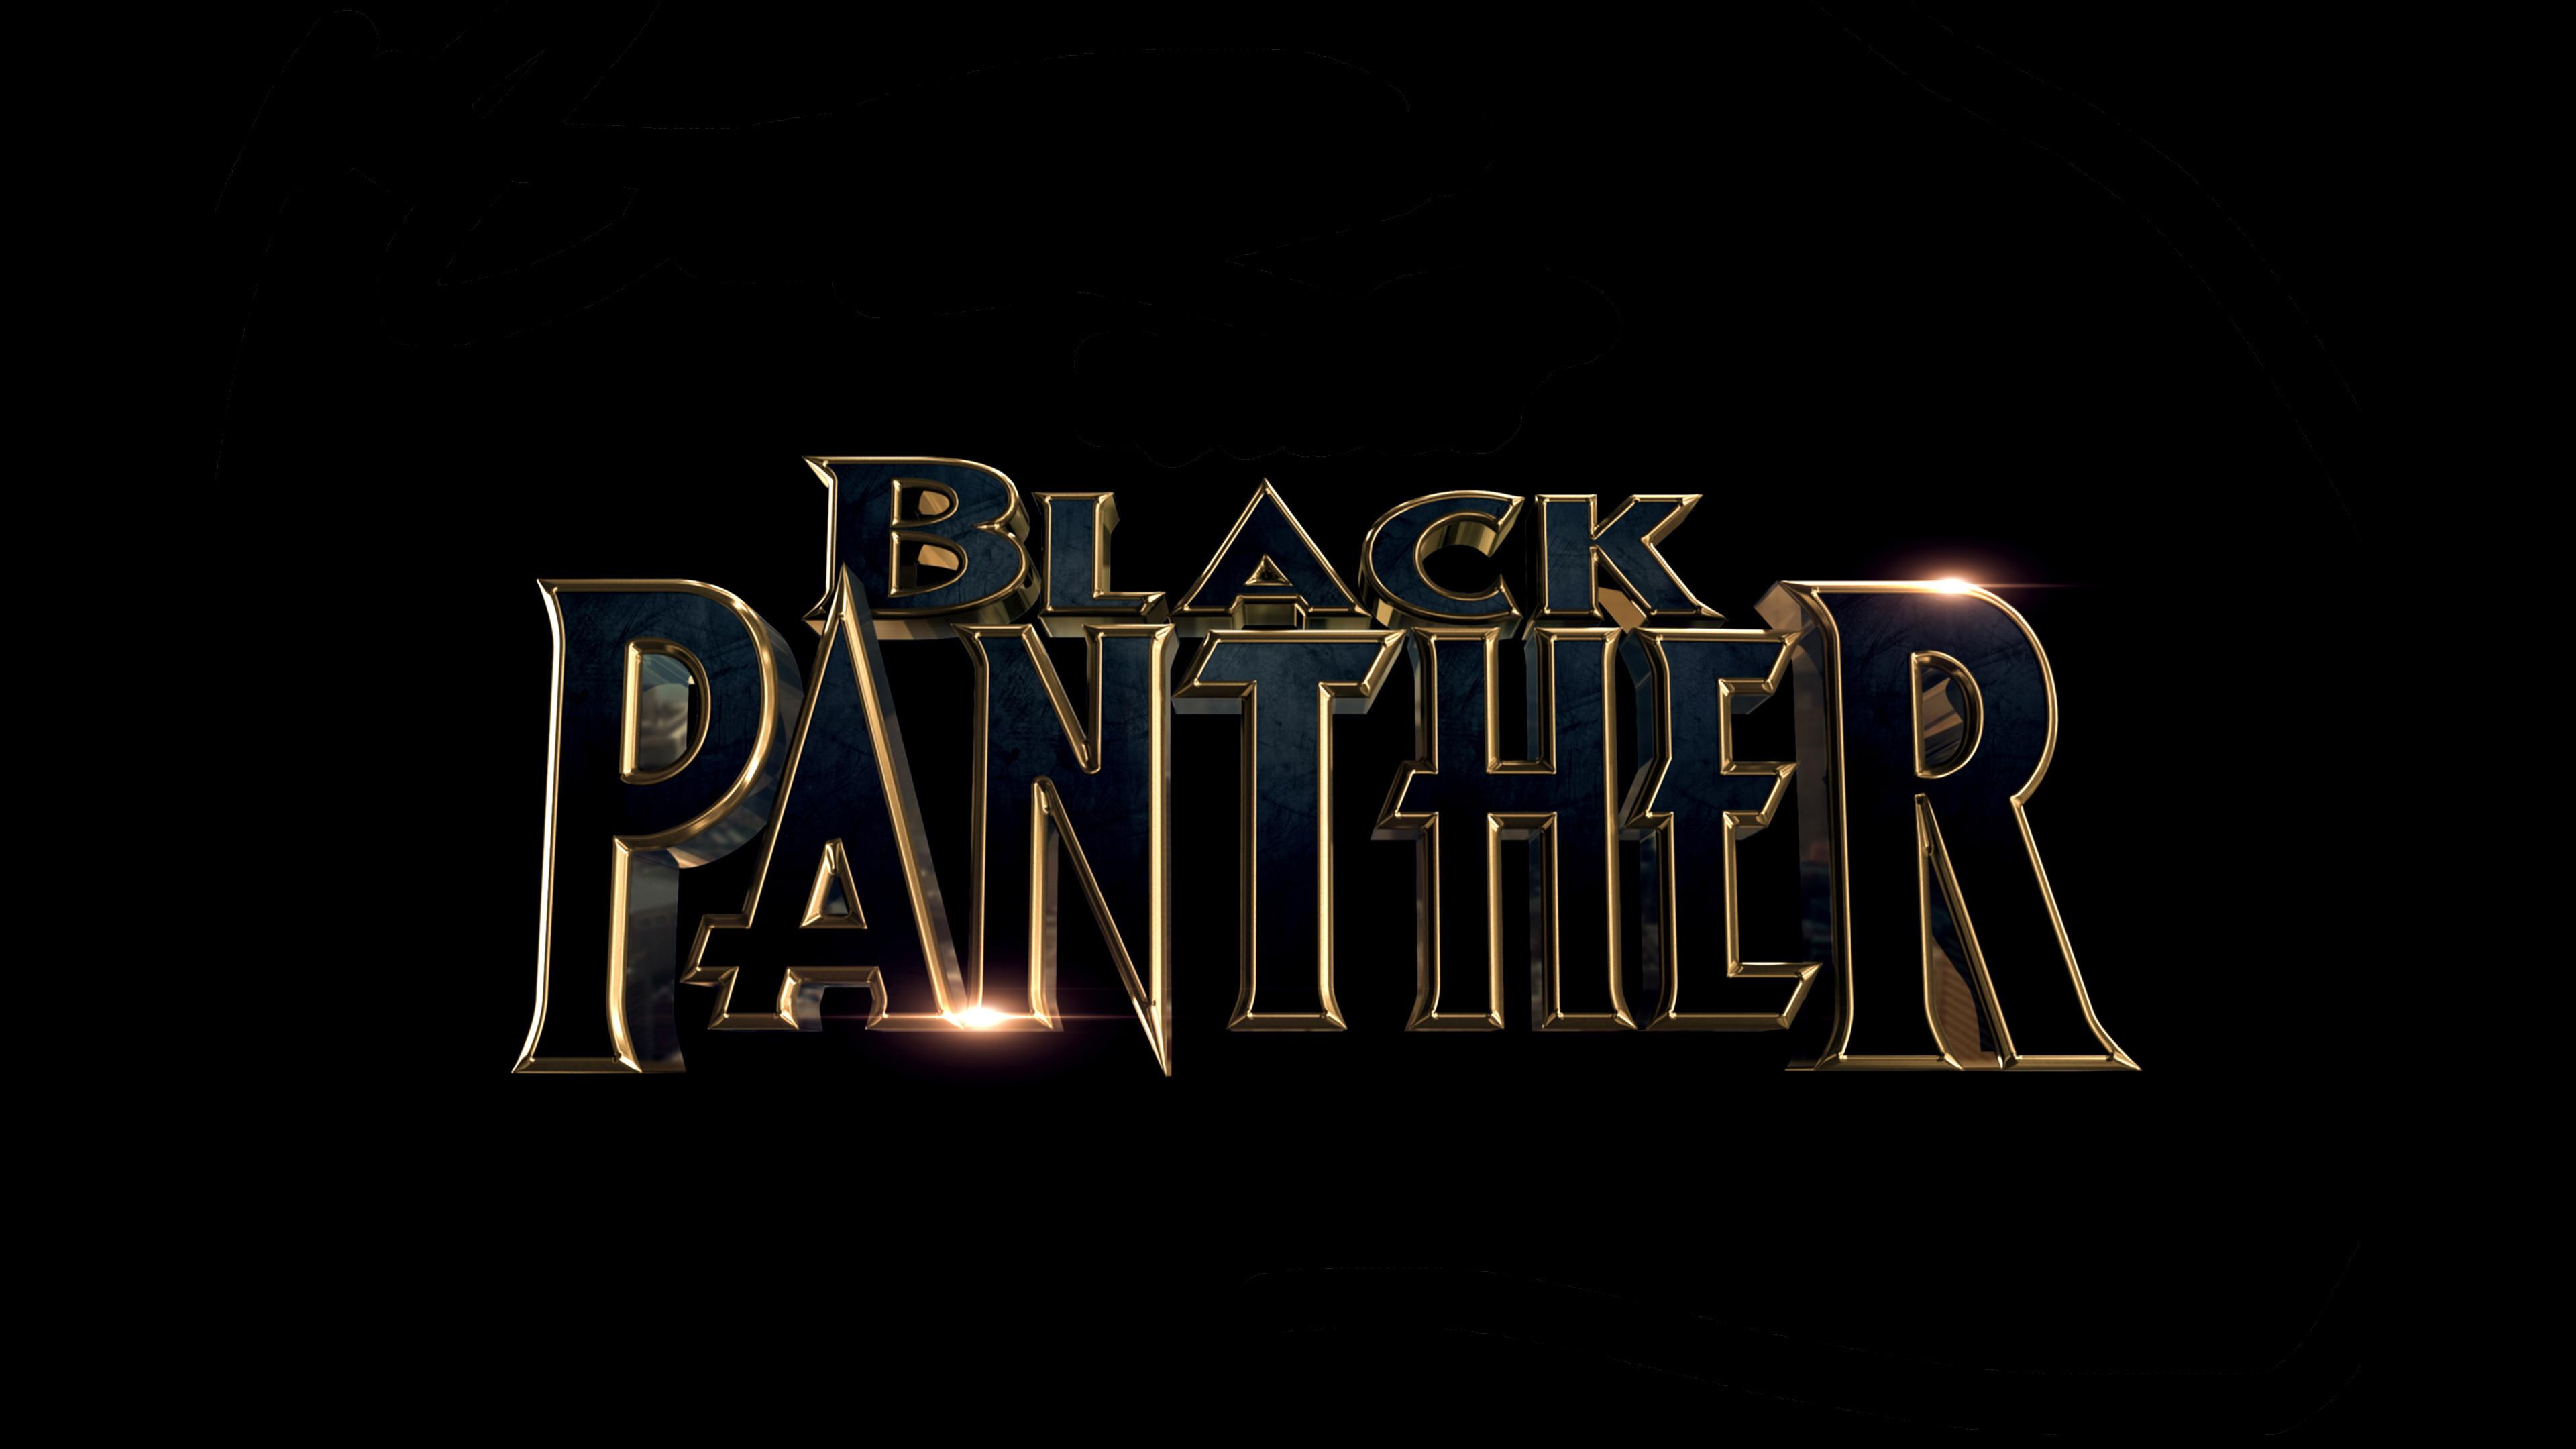 Res: 3840x2160, Black Panther 2018 Movie